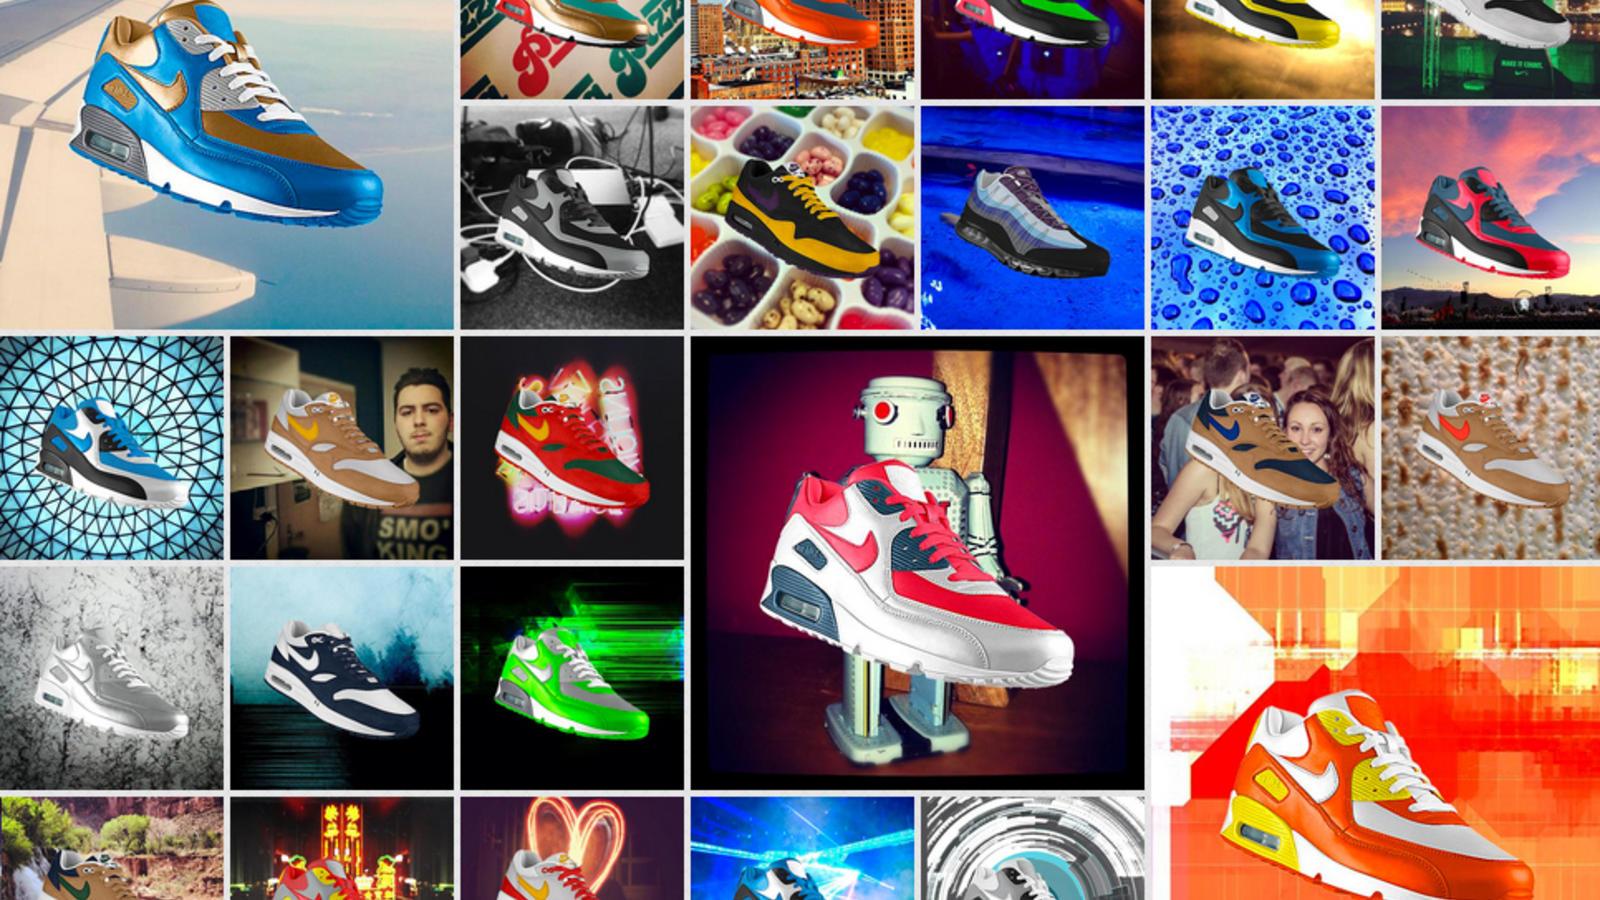 Nike PHOTOiD: The Power of an Image